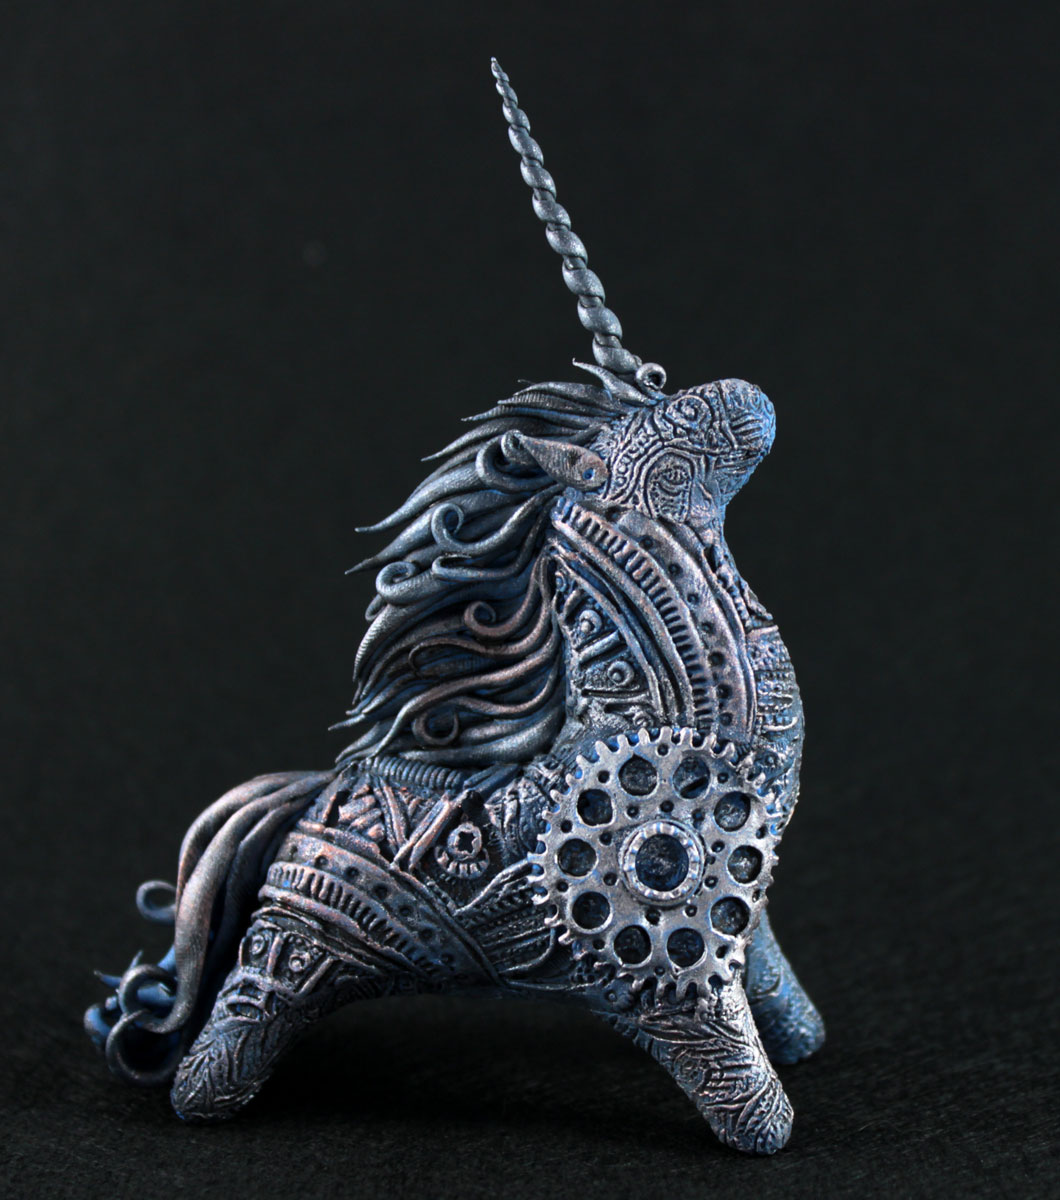 Steampunk Unicorn II by hontor